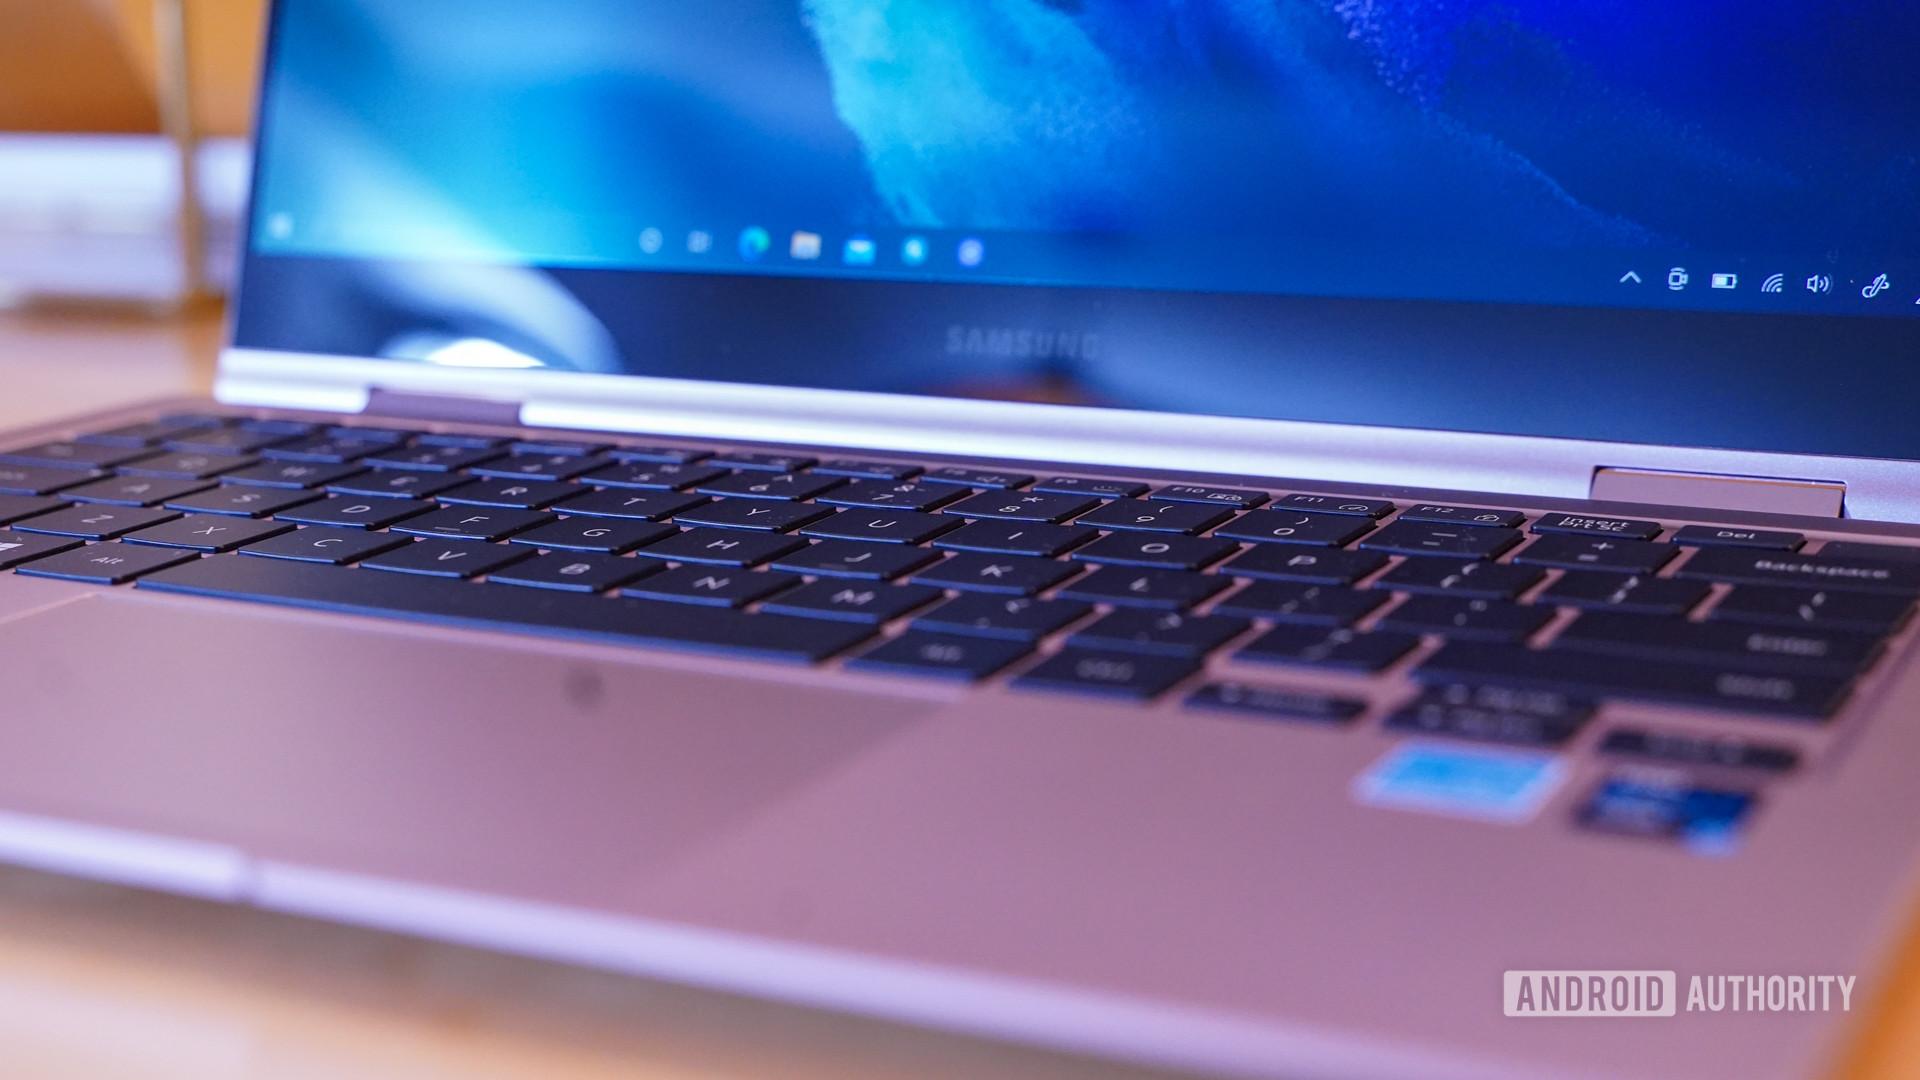 Samsung Galaxy Book Pro keyboard closeup